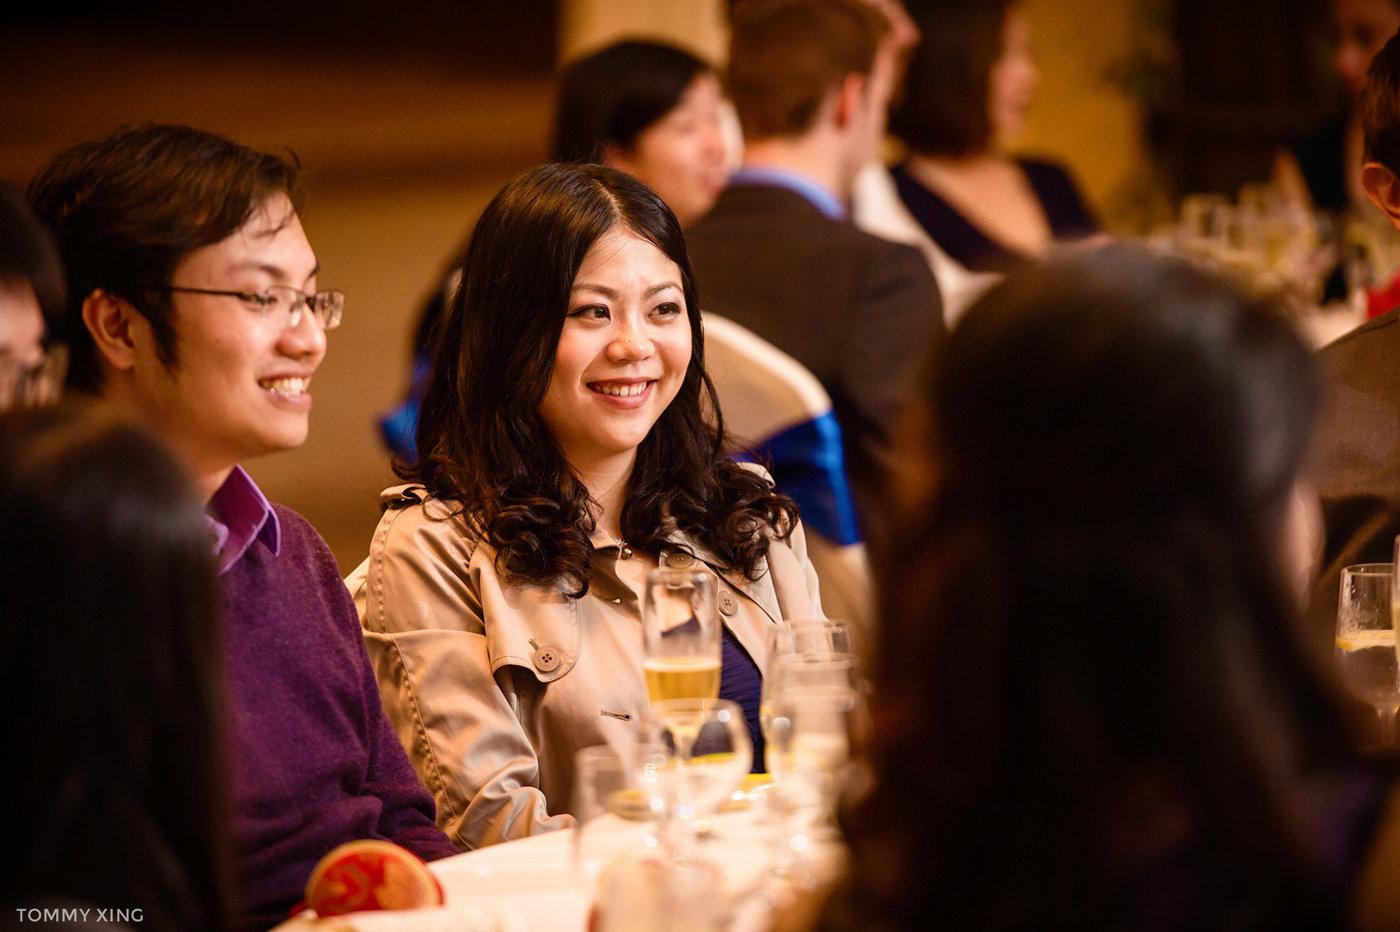 STANFORD MEMORIAL CHURCH WEDDING - Wenjie & Chengcheng - SAN FRANCISCO BAY AREA 斯坦福教堂婚礼跟拍 - 洛杉矶婚礼婚纱照摄影师 Tommy Xing Photography183.jpg